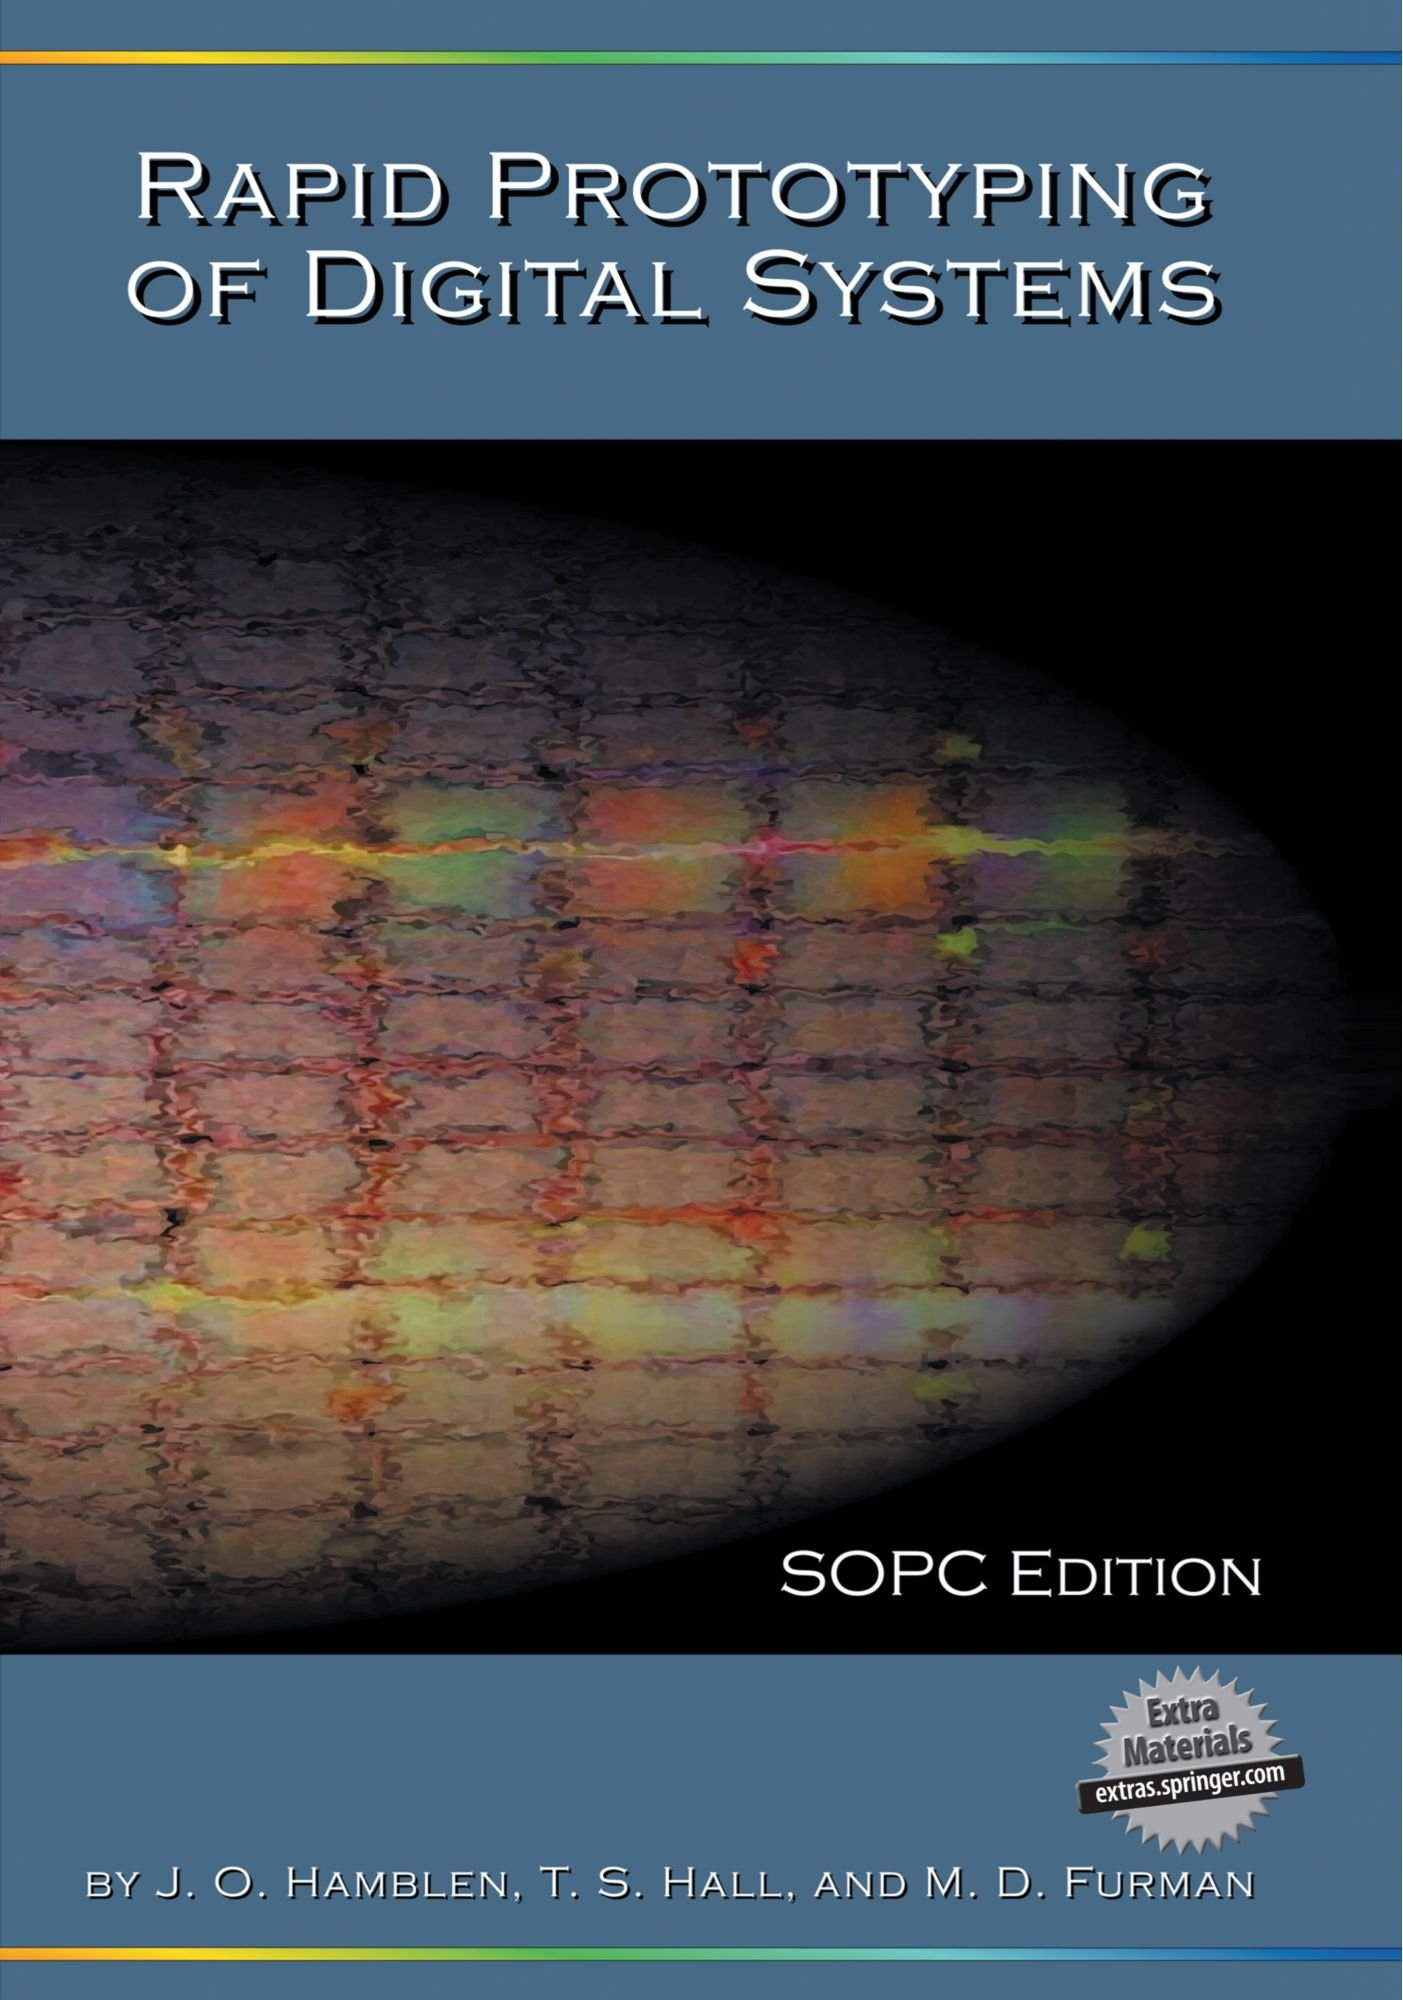 Rapid Prototyping of Digital Systems: SOPC Edition by James O Hamblen